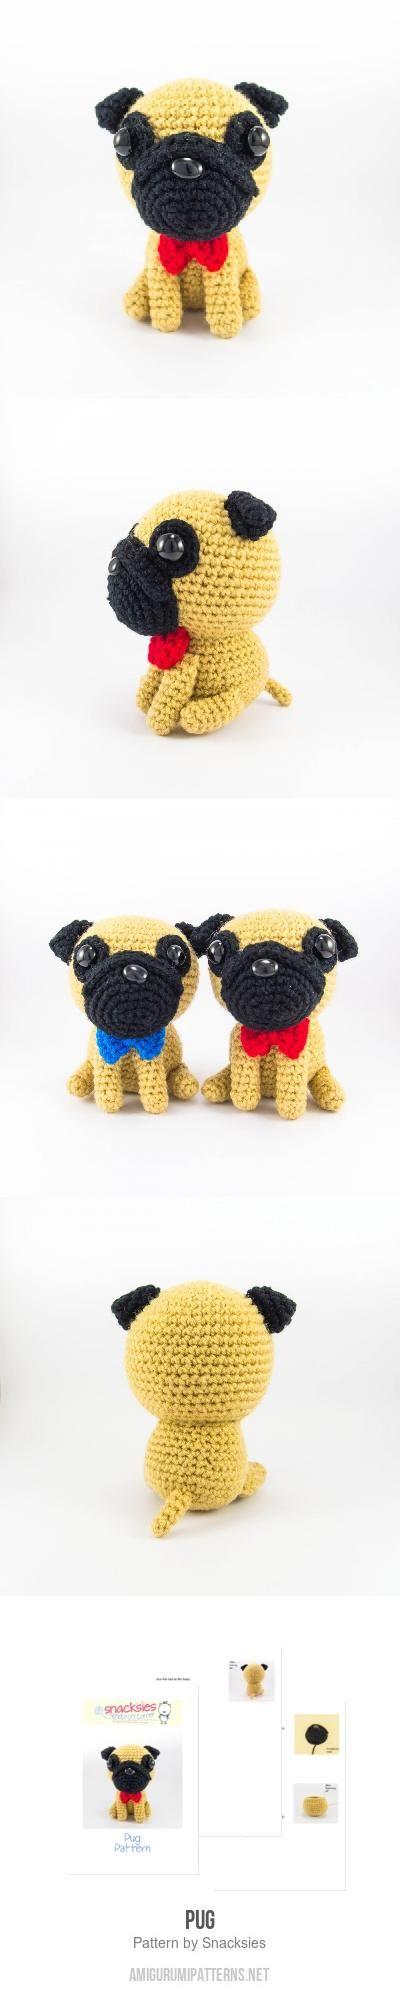 Little Pug Amigurumi Pattern